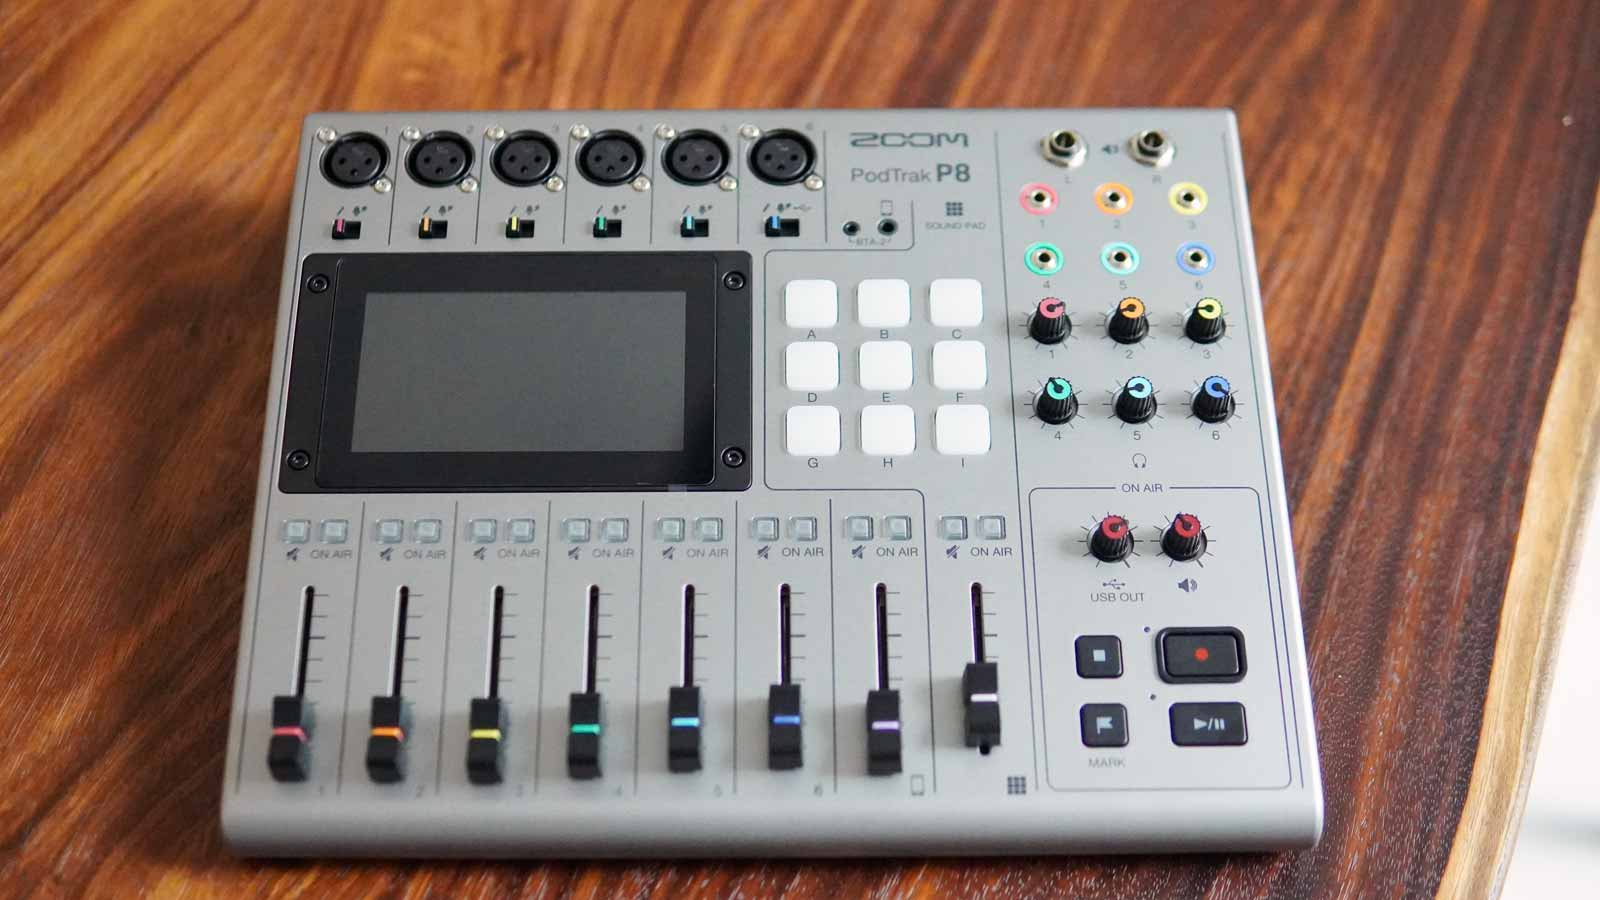 podtrak-p8-mix-minus